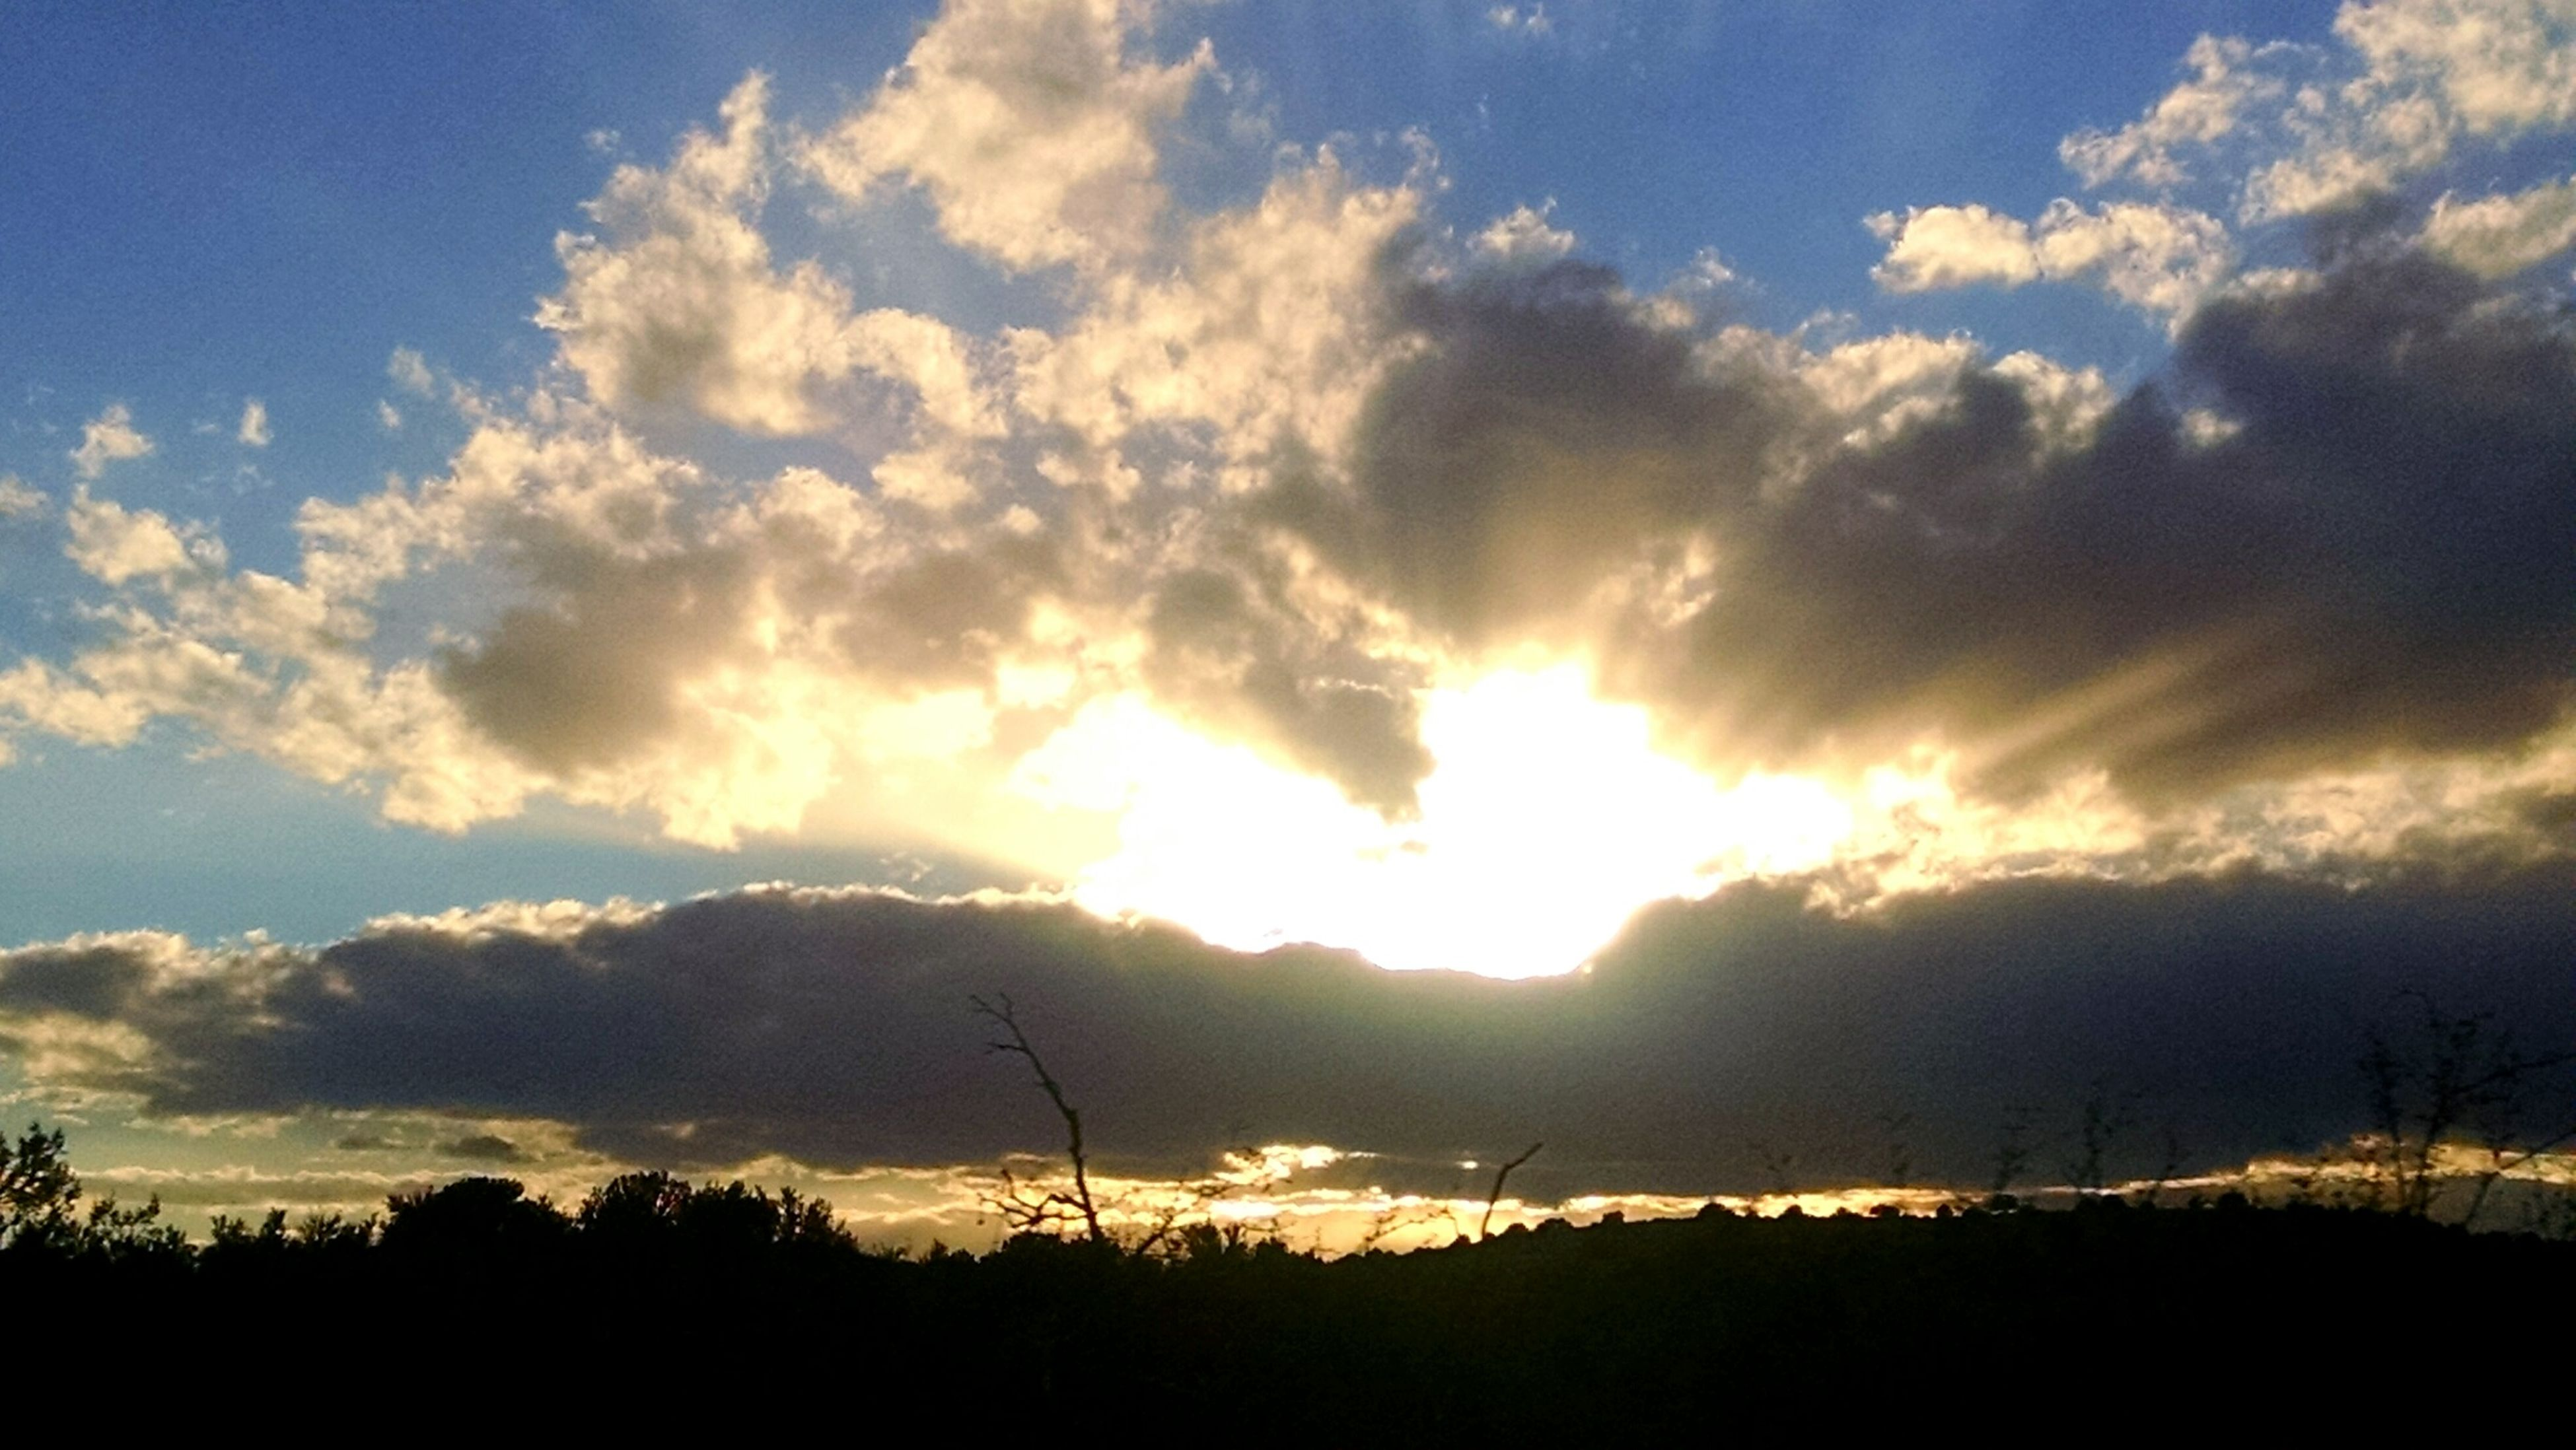 sky, silhouette, sunset, tranquility, tranquil scene, beauty in nature, scenics, cloud - sky, sun, nature, electricity pylon, power line, low angle view, landscape, cloud, electricity, sunlight, idyllic, tree, sunbeam